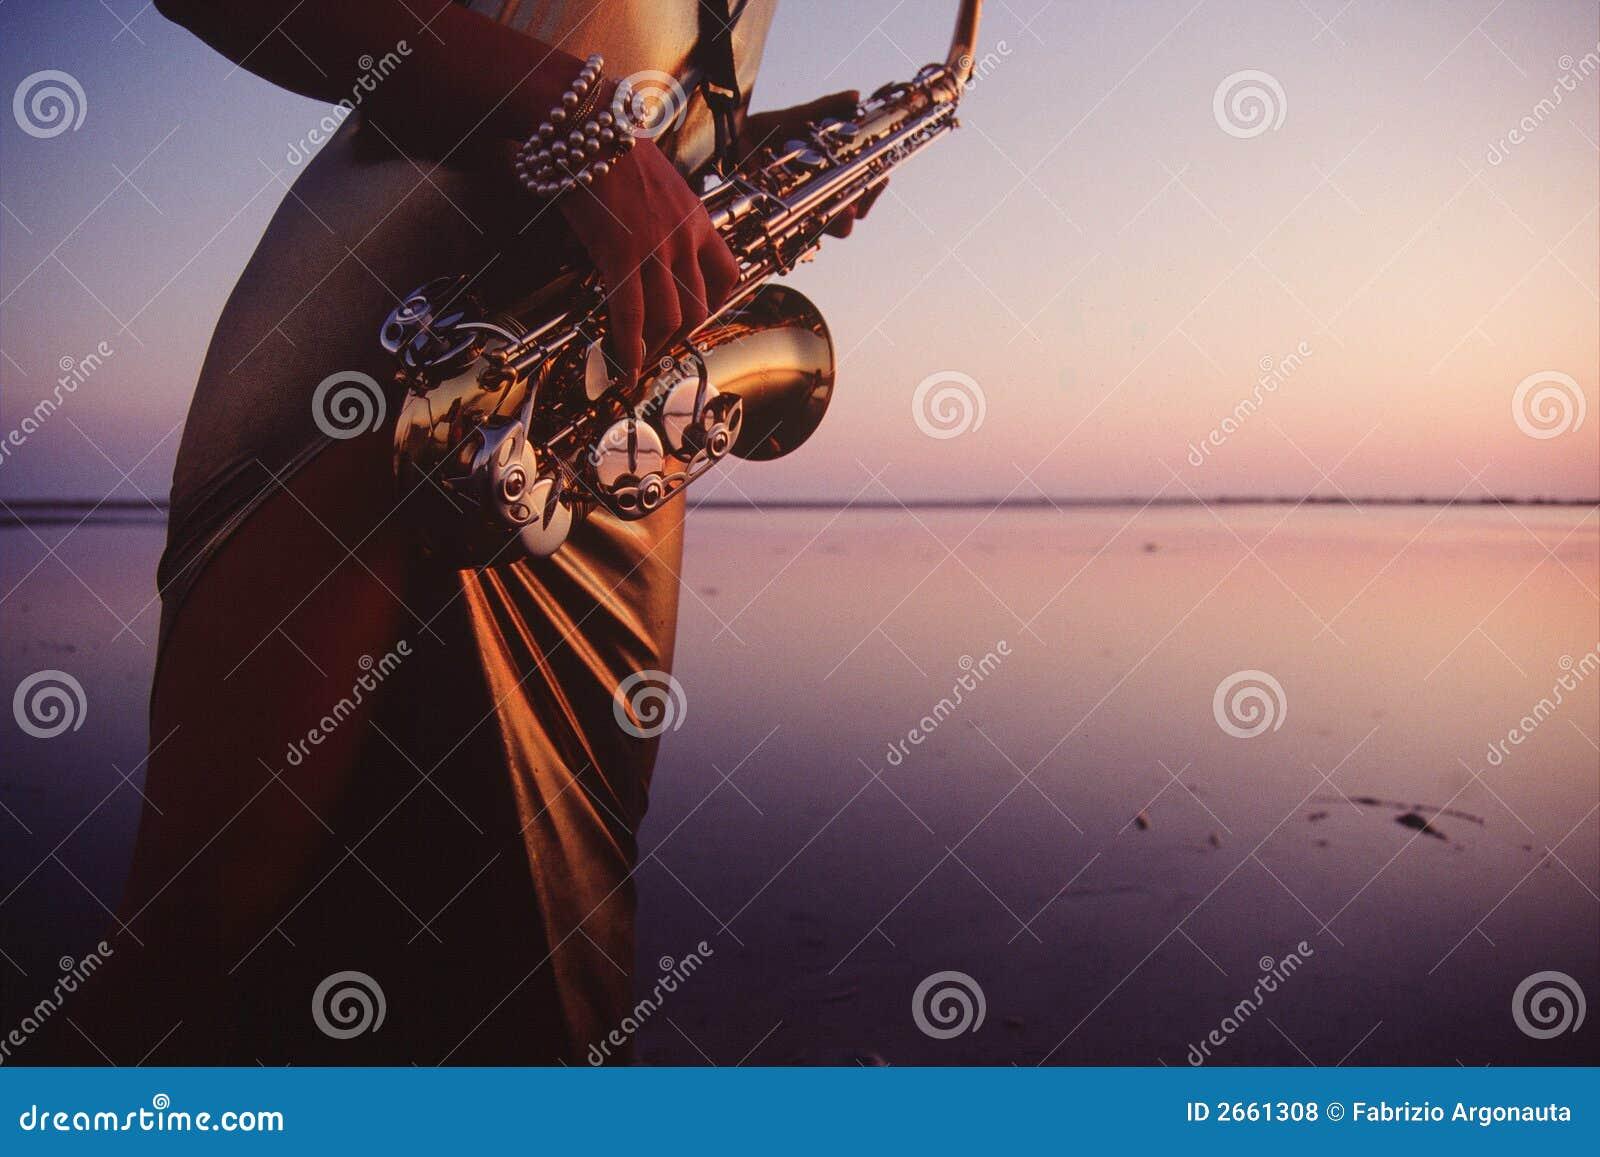 Saxophone water melody